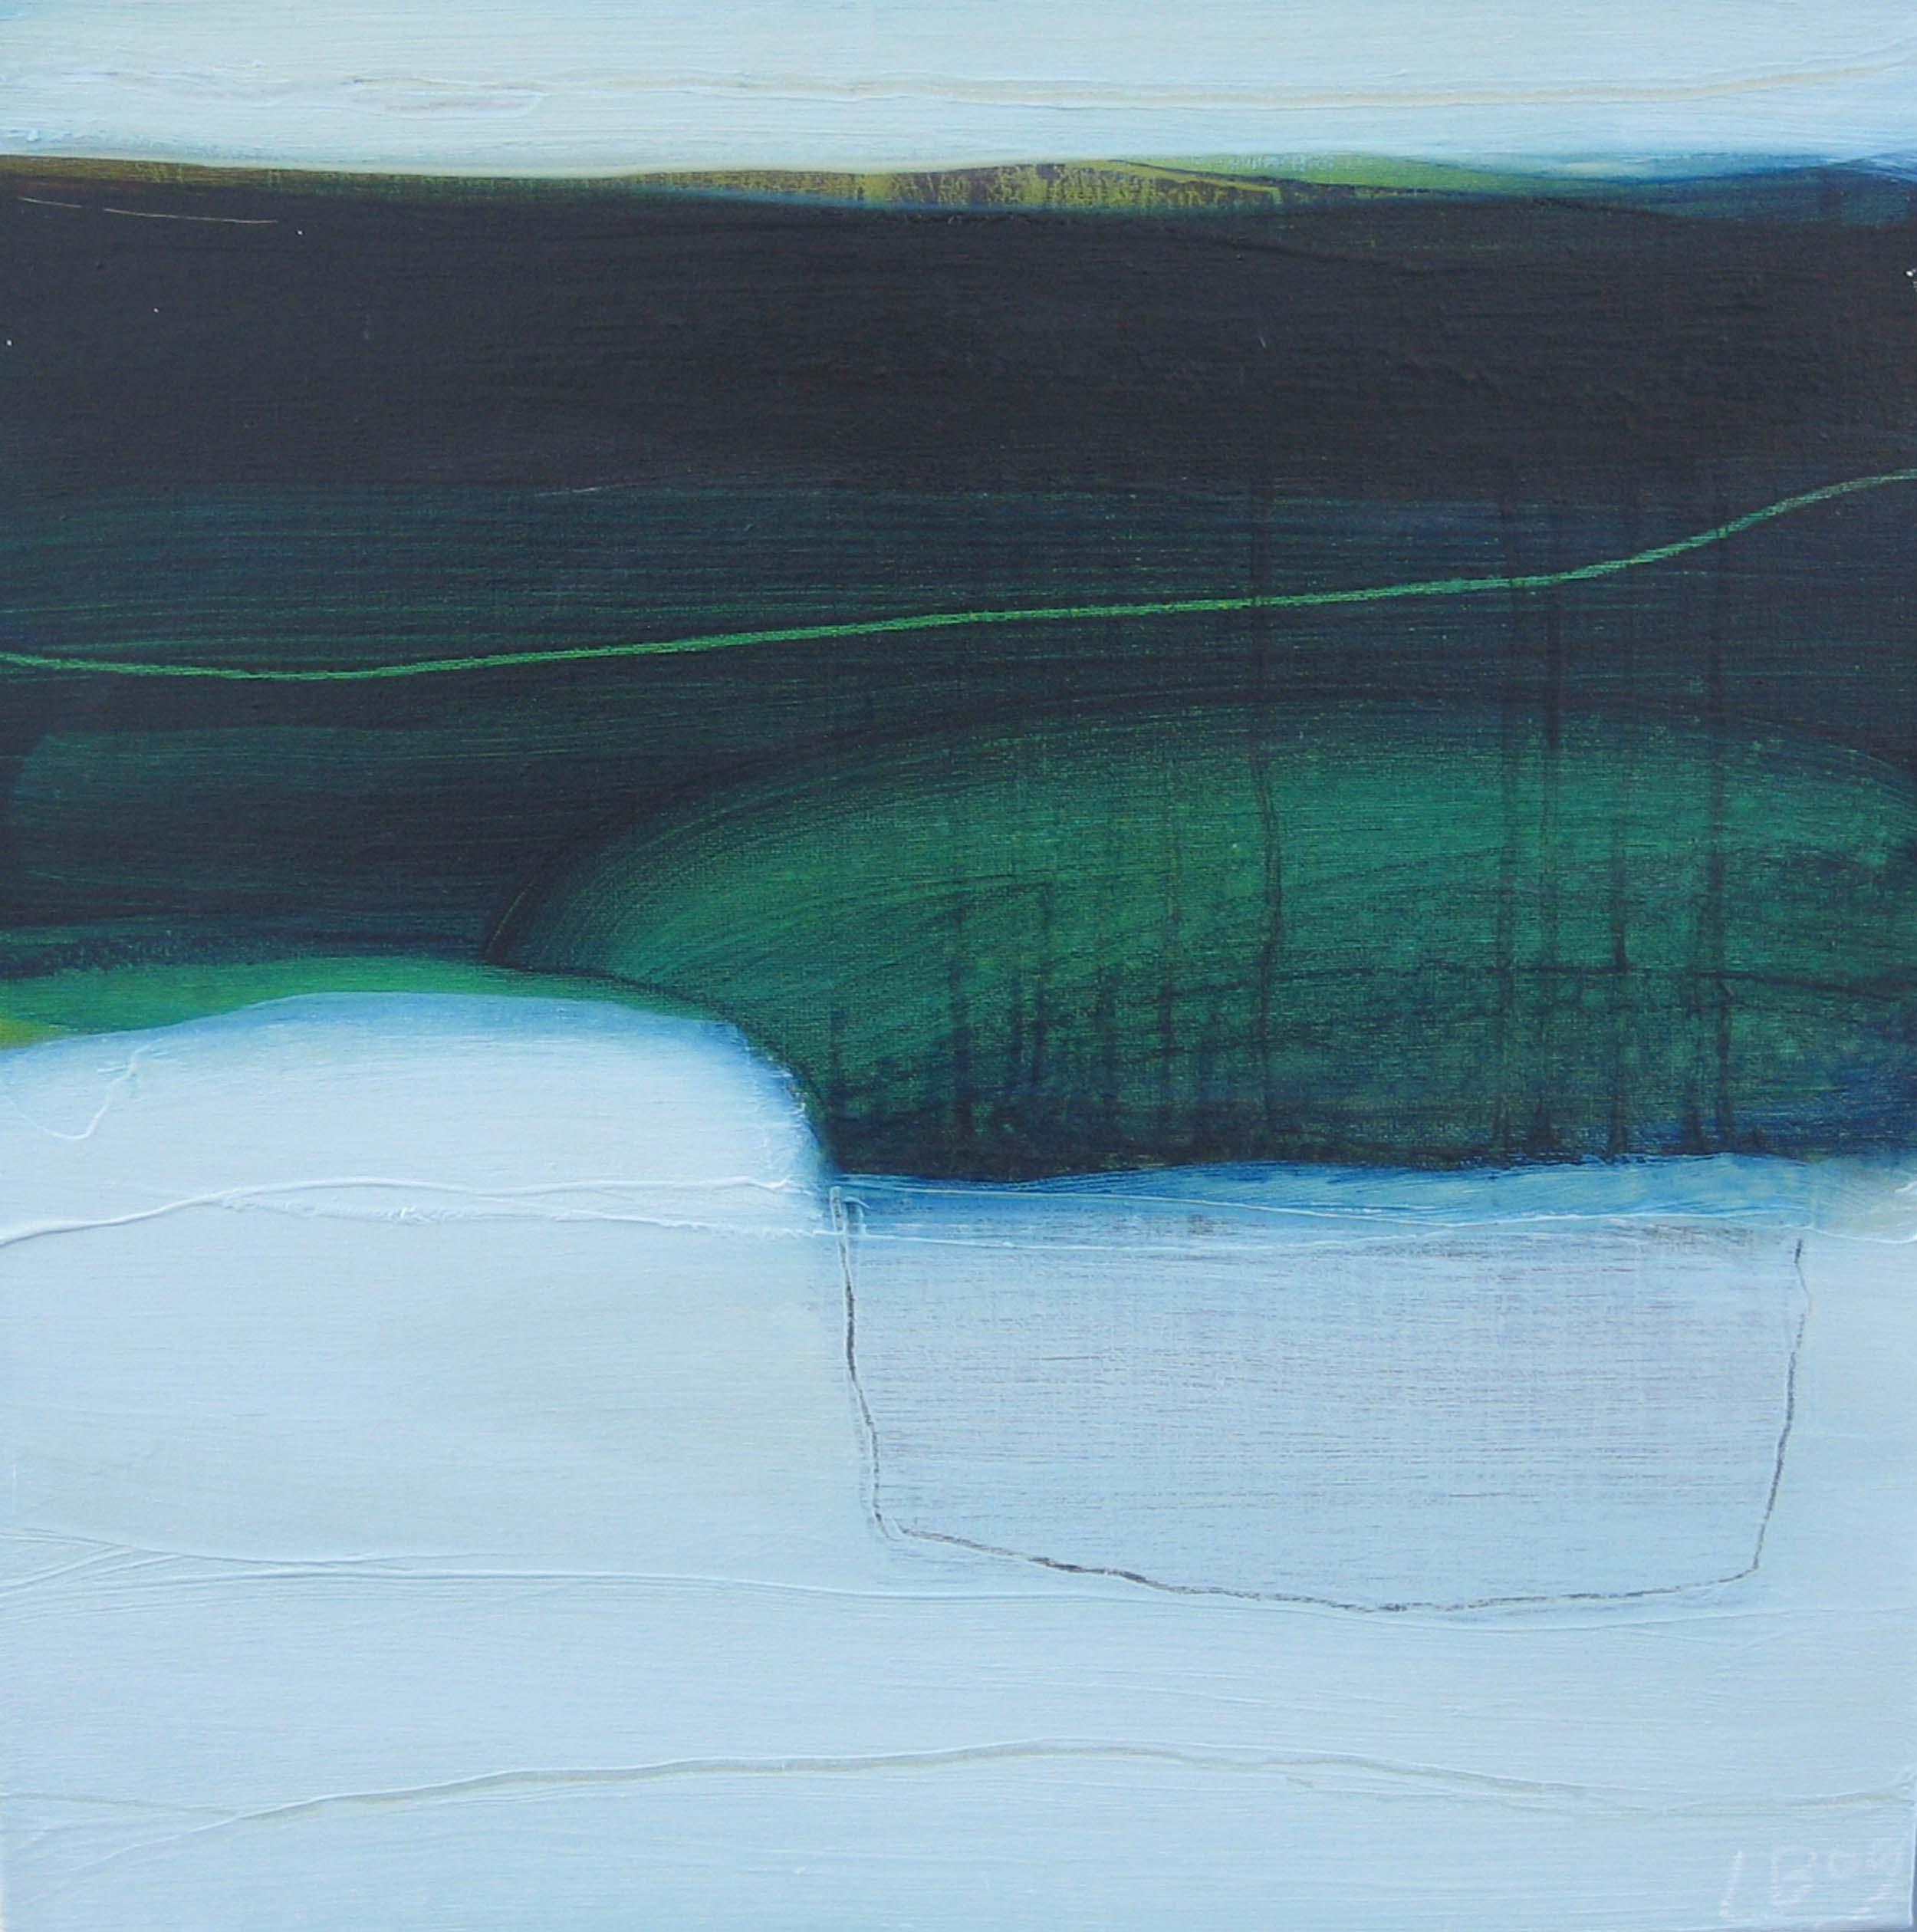 Leah Beggs 2009  - Submerged - Oil on Canvas  - 41 x 41 cm_sml.jpg